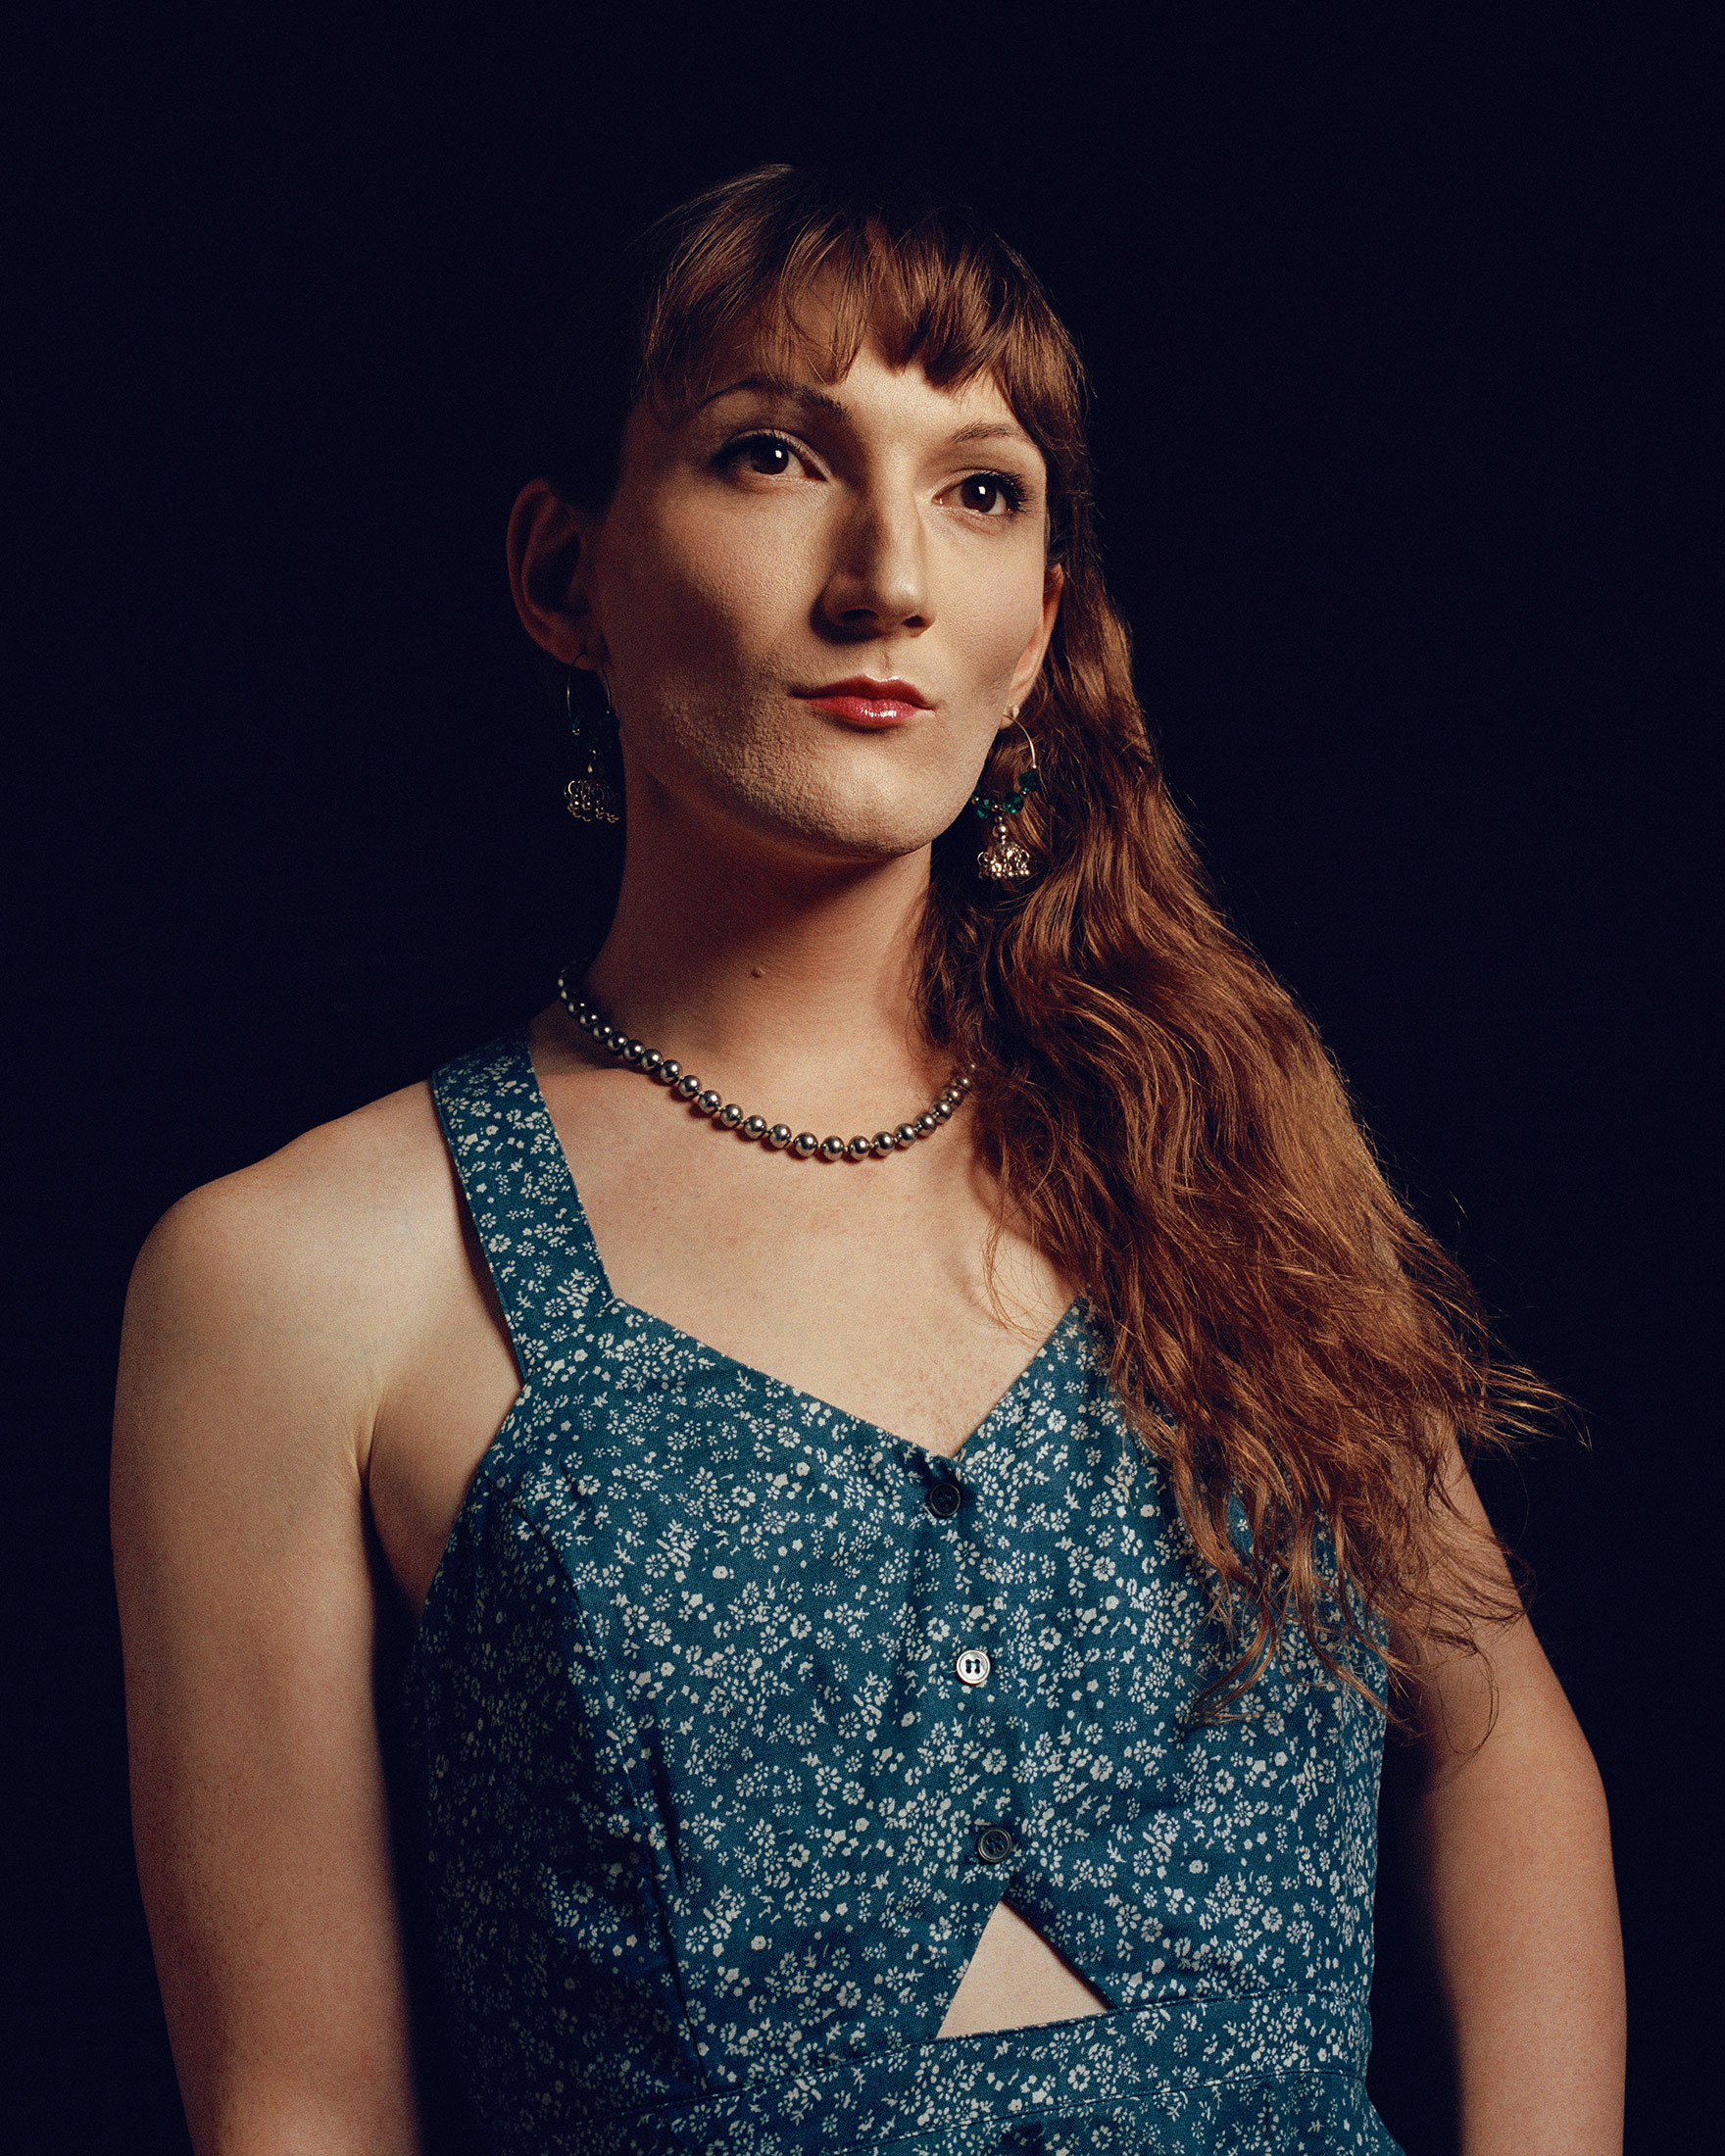 transvestite-meetings-pennsylvania